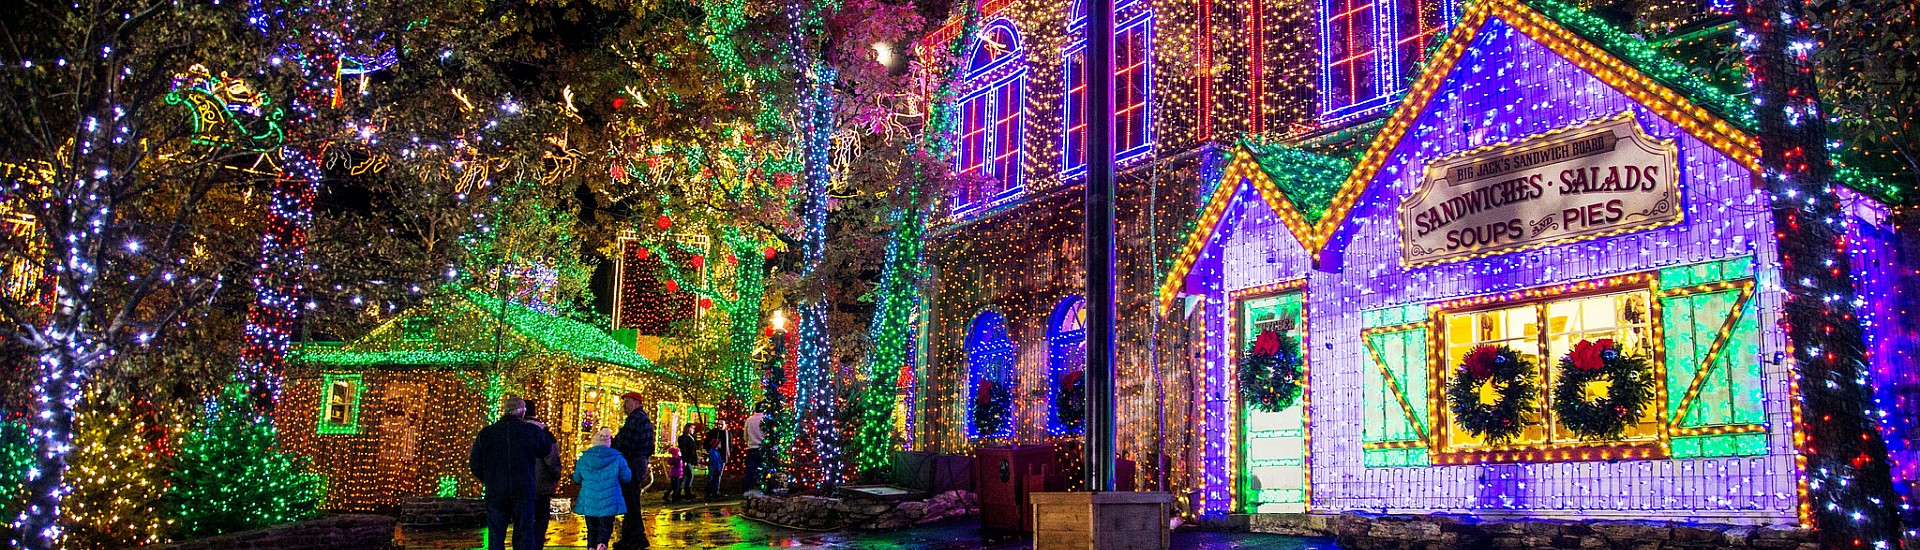 Christmas In Branson 2019 5+ of the Best Branson Christmas Light Displays!   Branson Travel